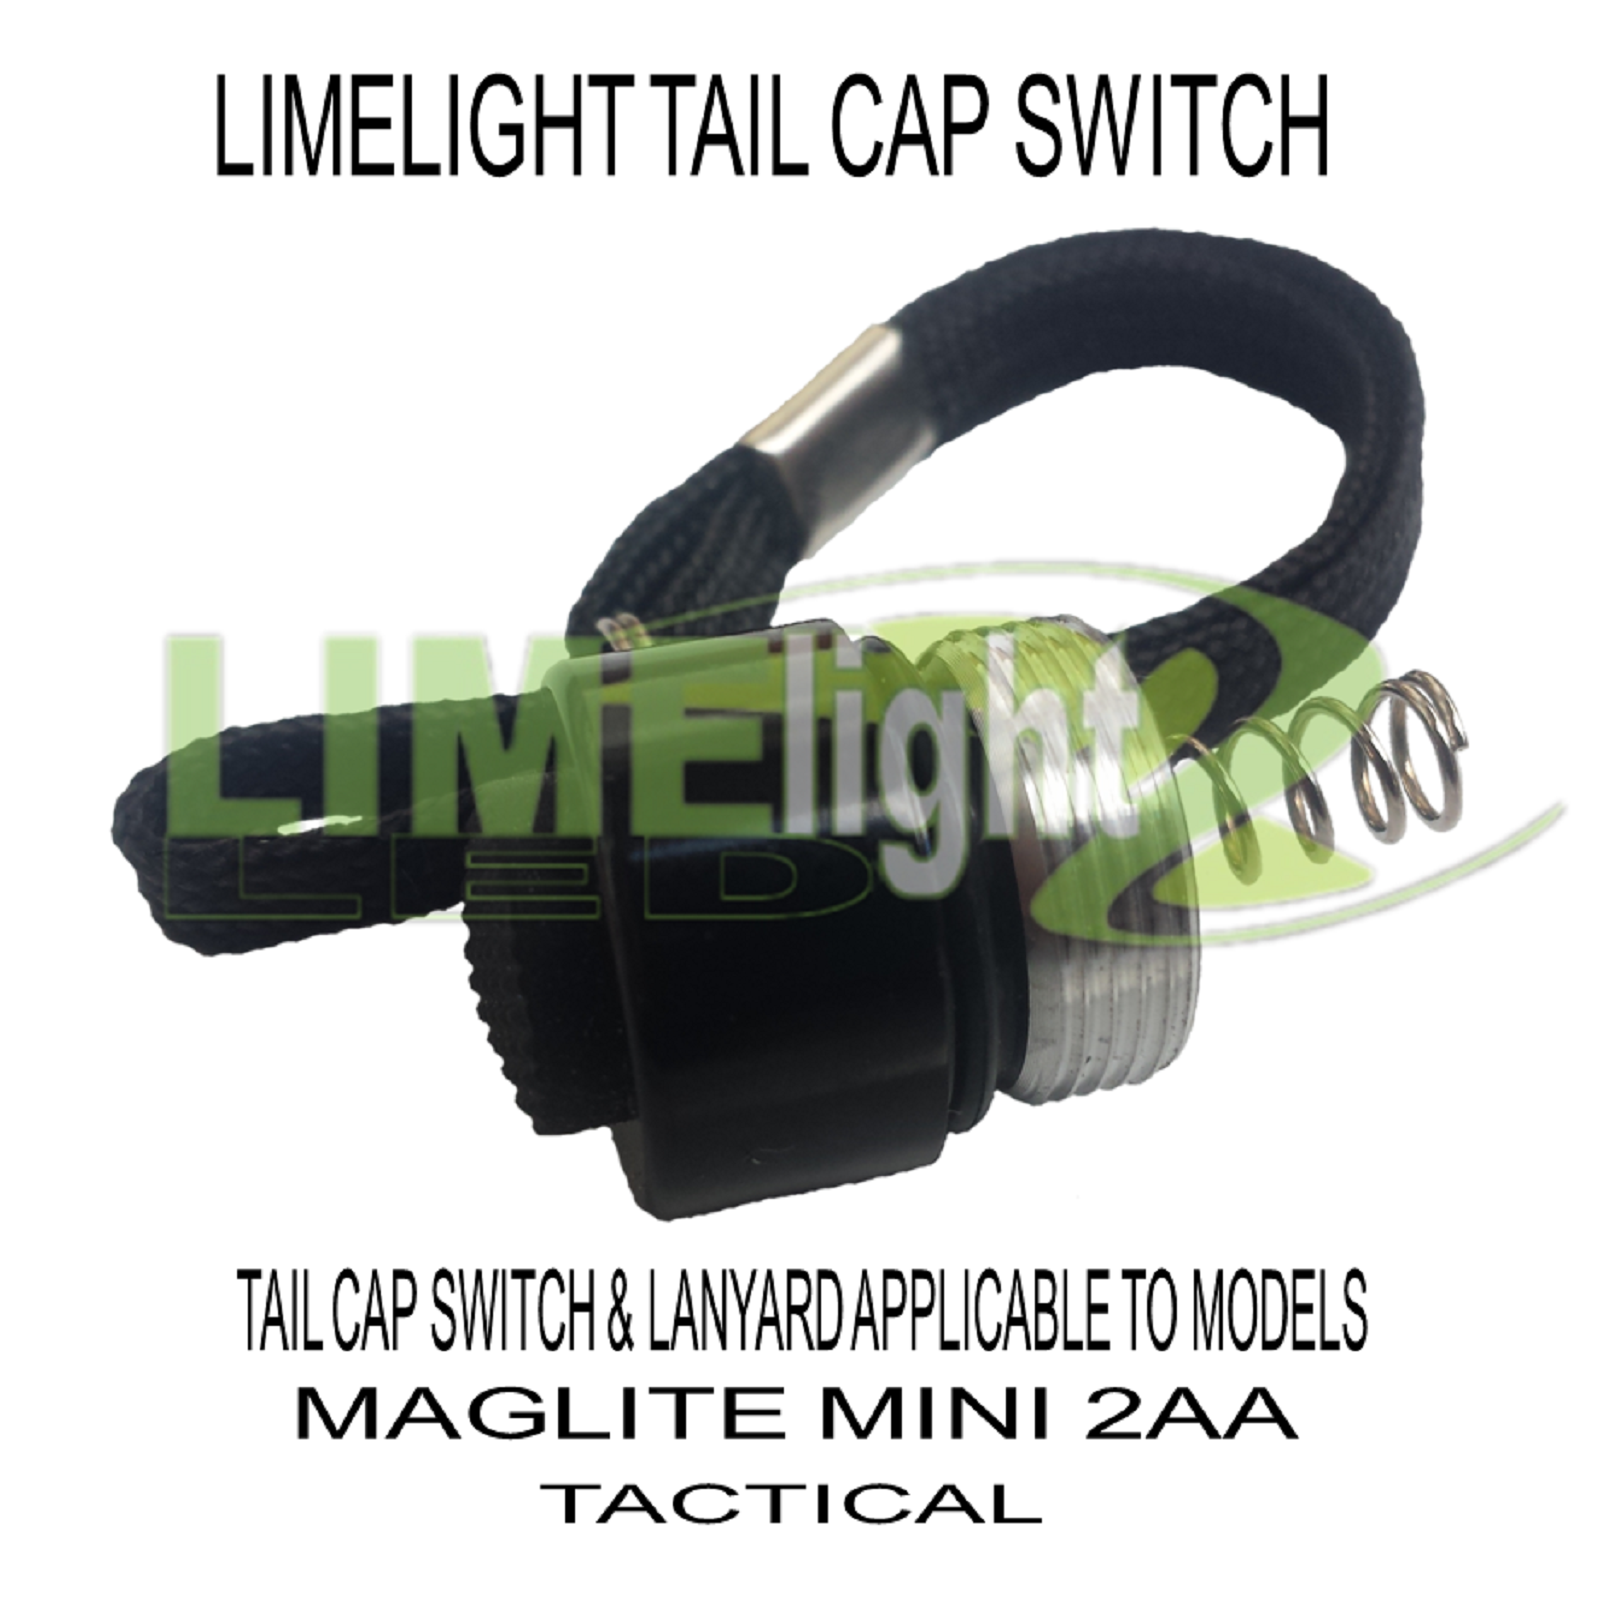 Maglite Led Upgrade Conversion Cree 1W-10W Bulb Globe Flashlight Torch 90-1100Lm 10